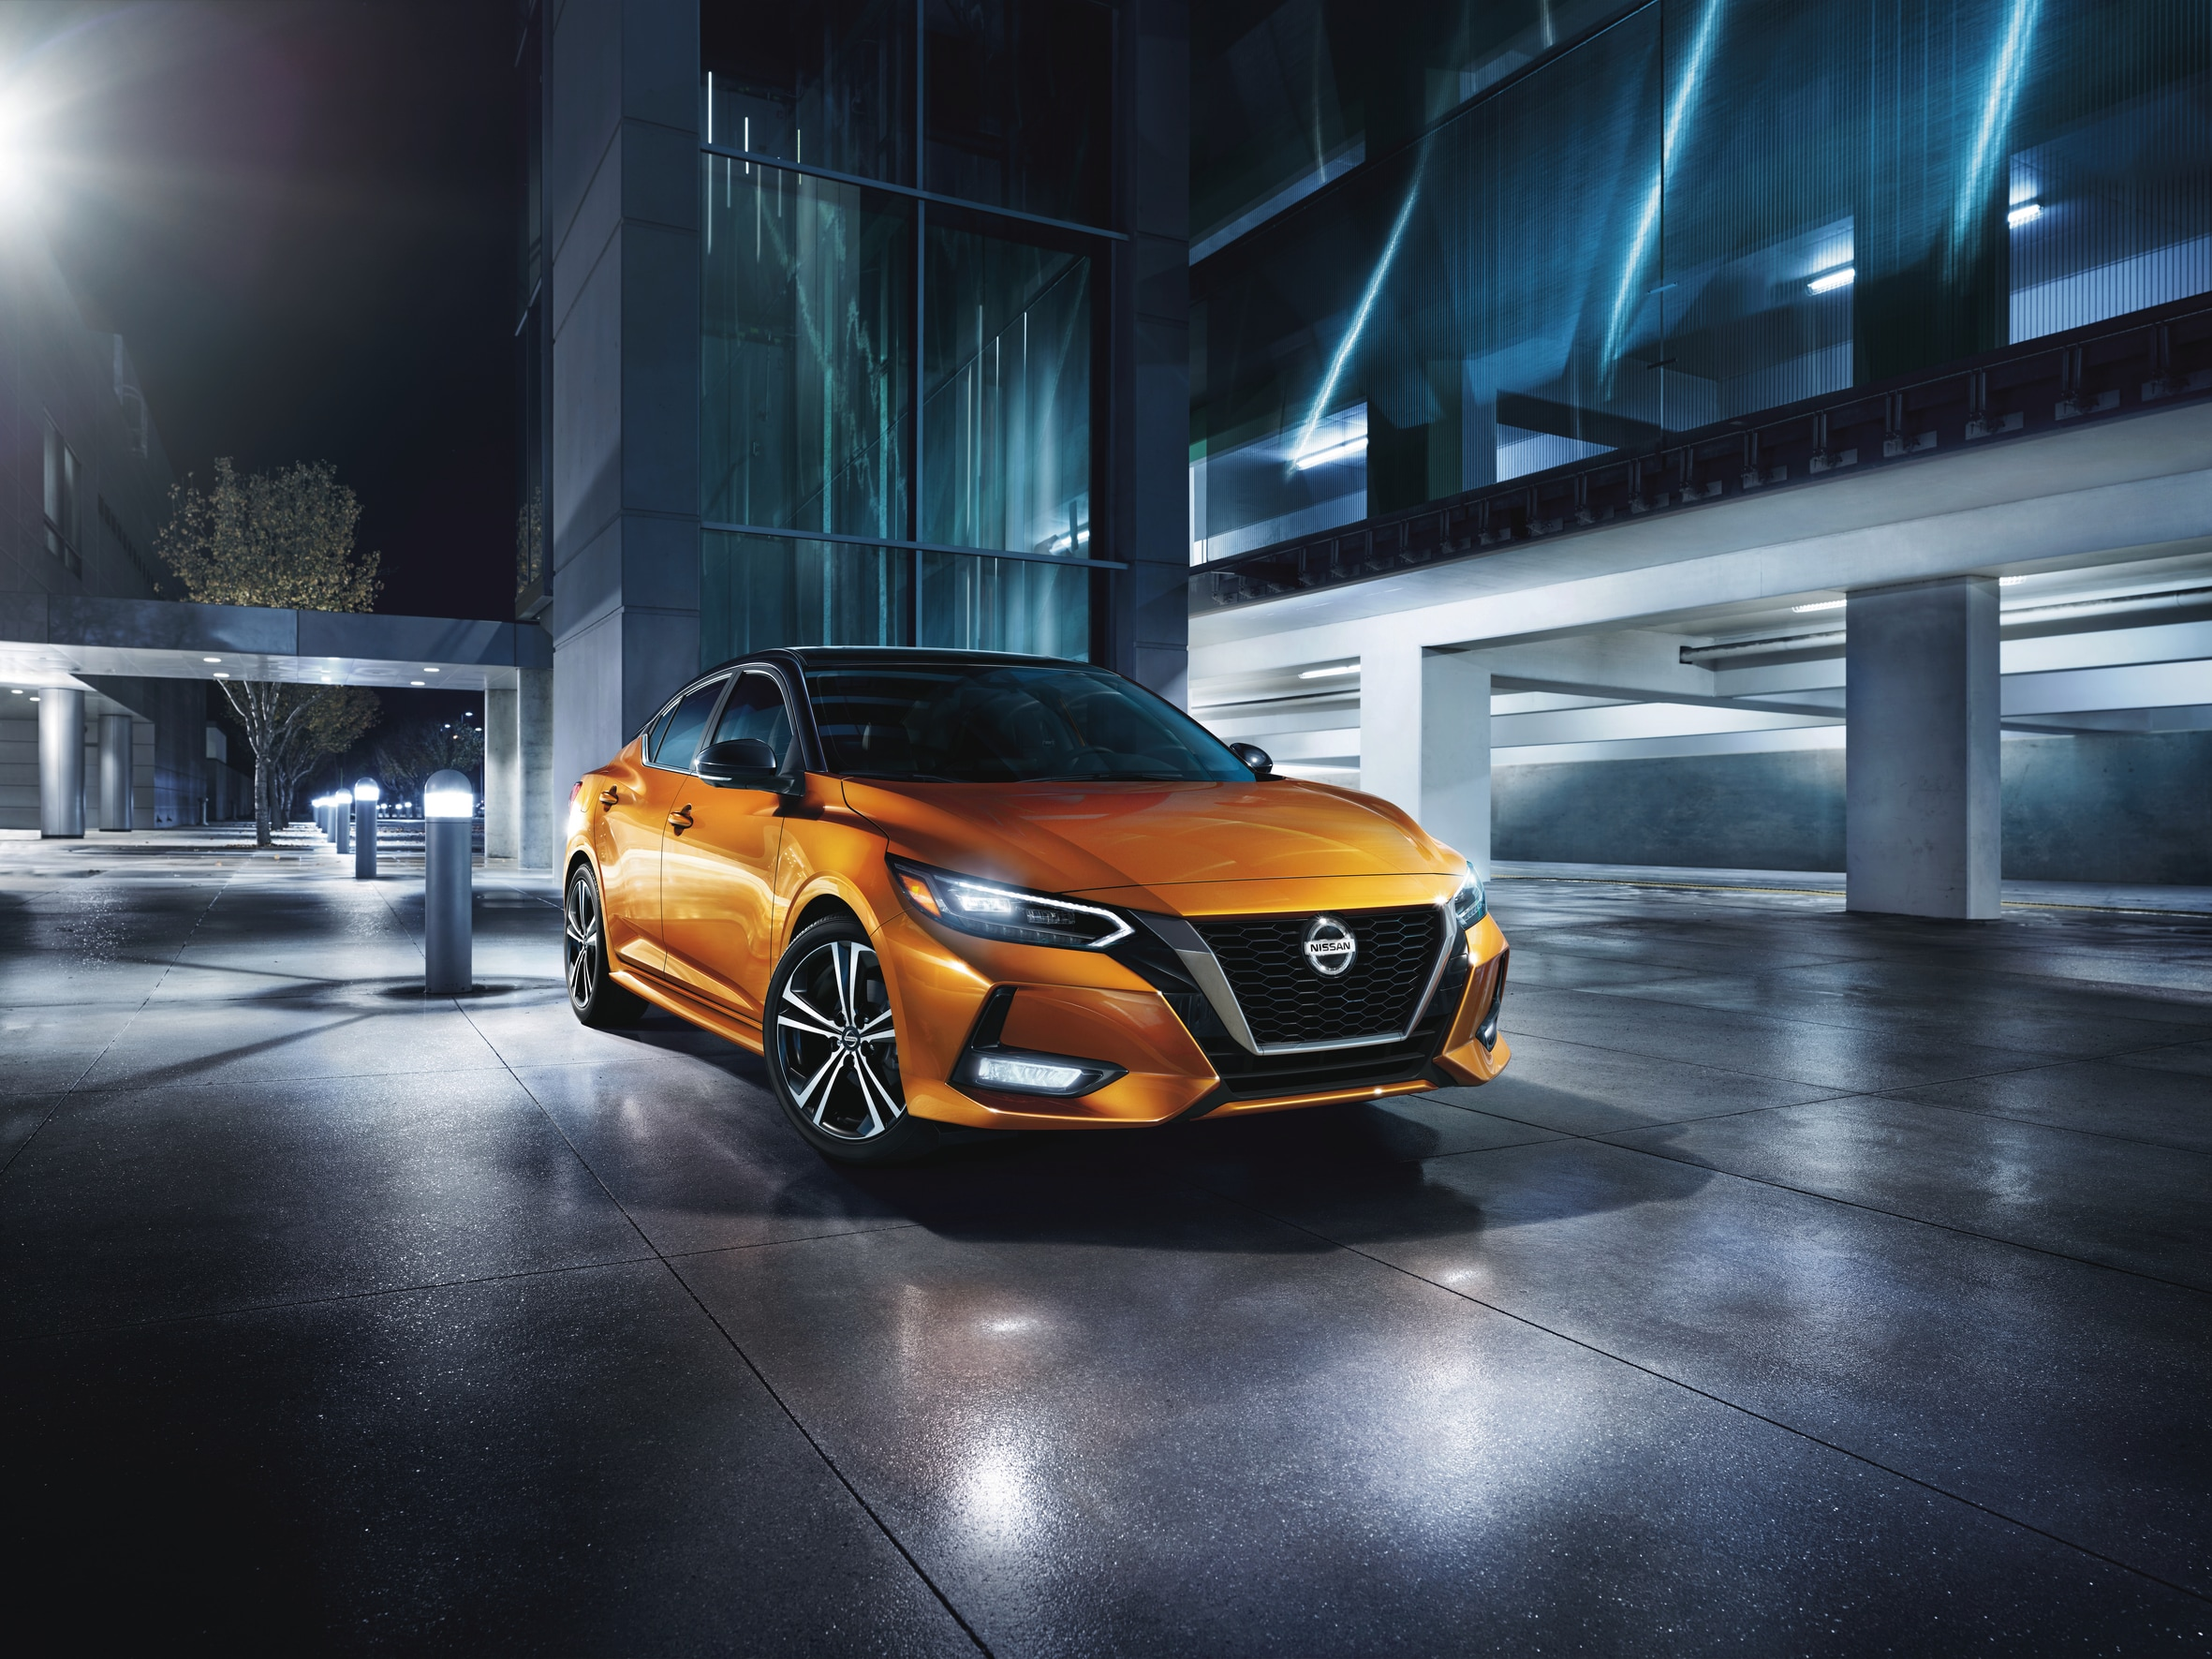 3/4 View 2021 Nissan Sentra Monarch Orange and Black